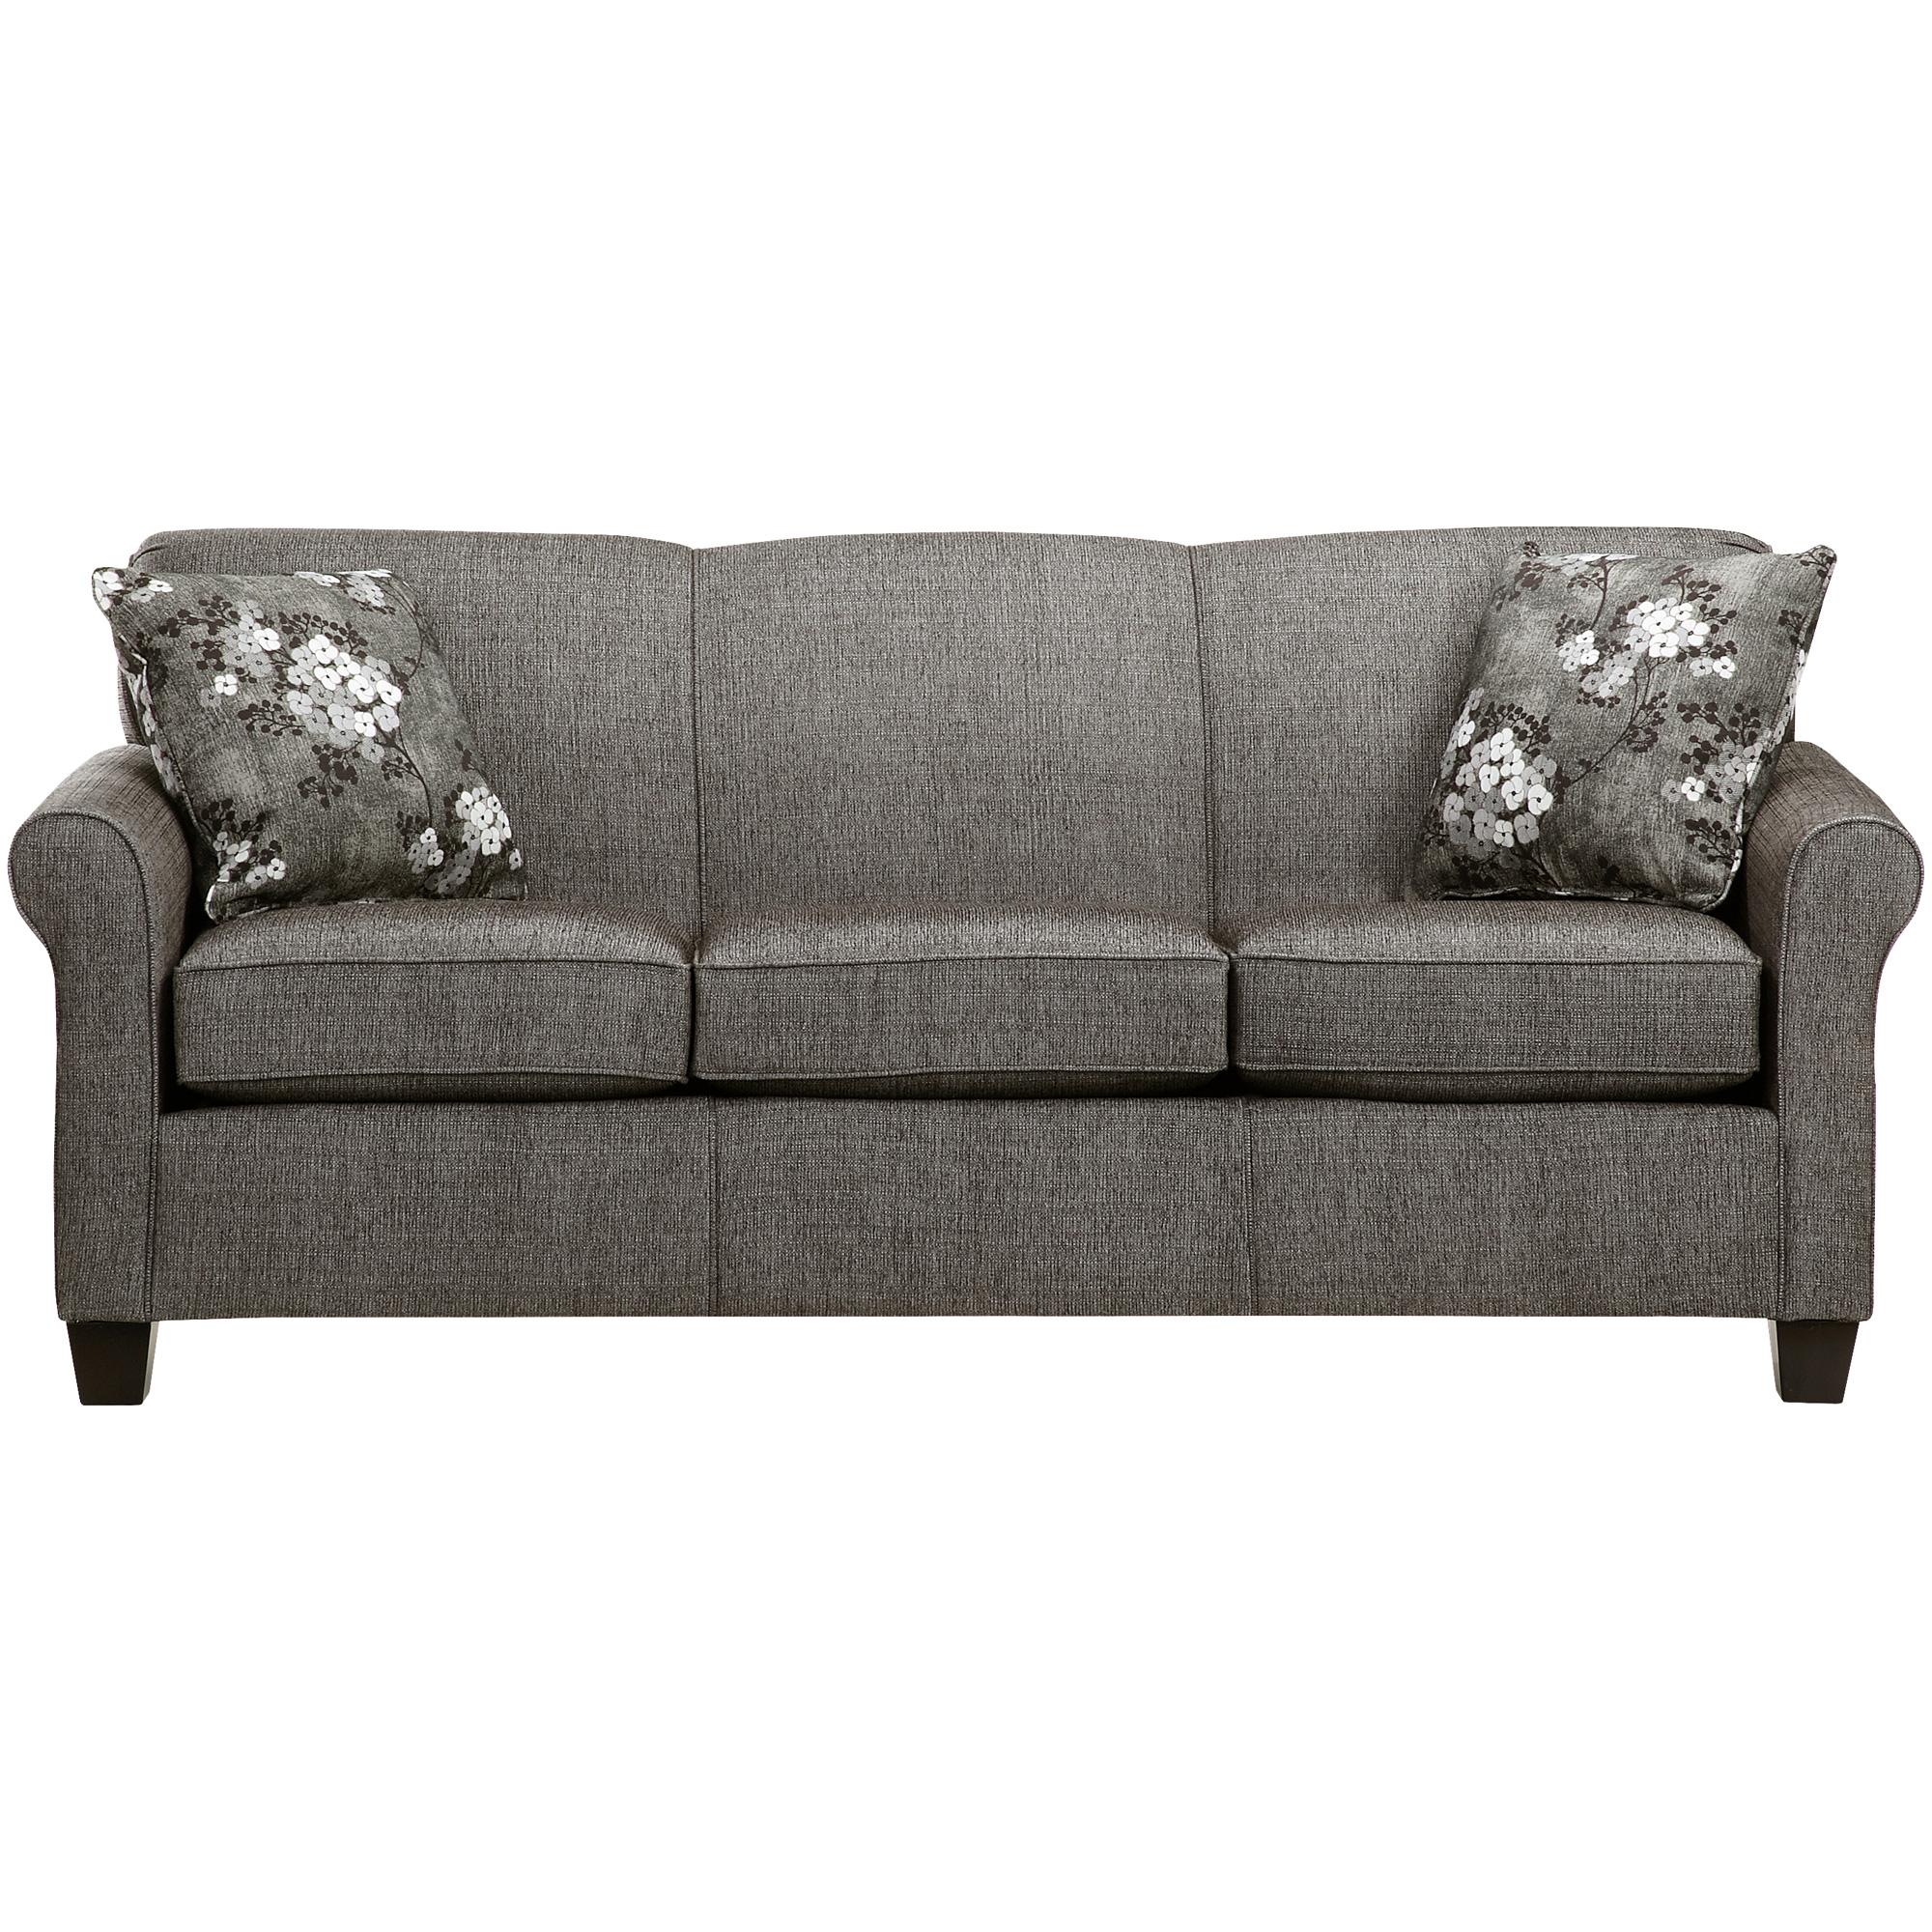 Dimensions By England   York Granite Queen Visco Sleeper Sofa